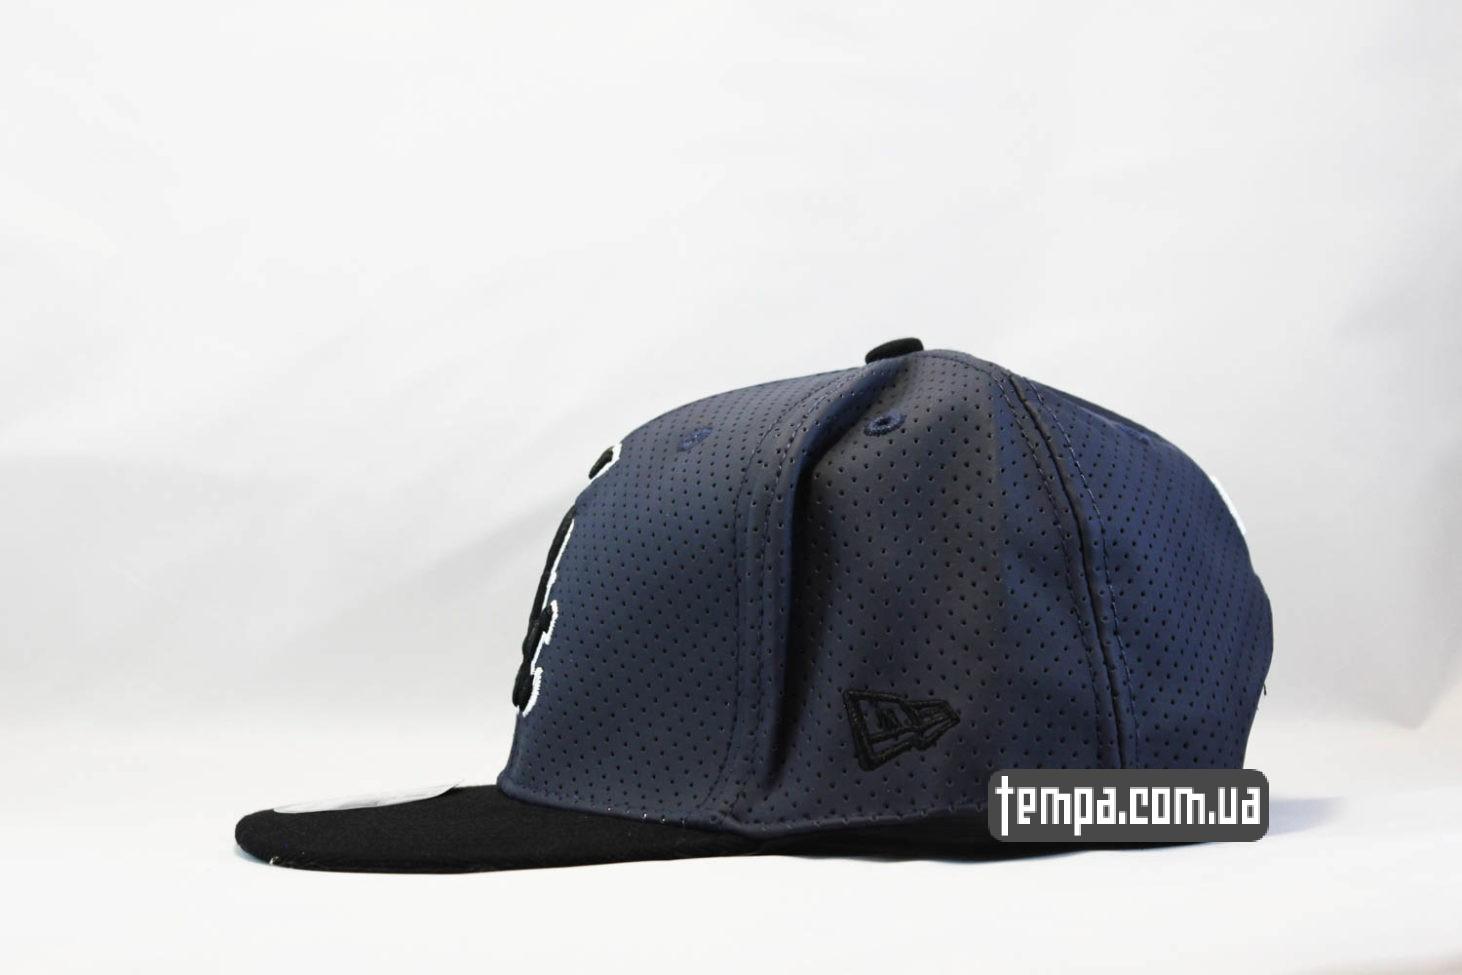 чикаго сокс бейсболная команда кепка snapback TRUCKER Chicago White Sox new era с сеткой